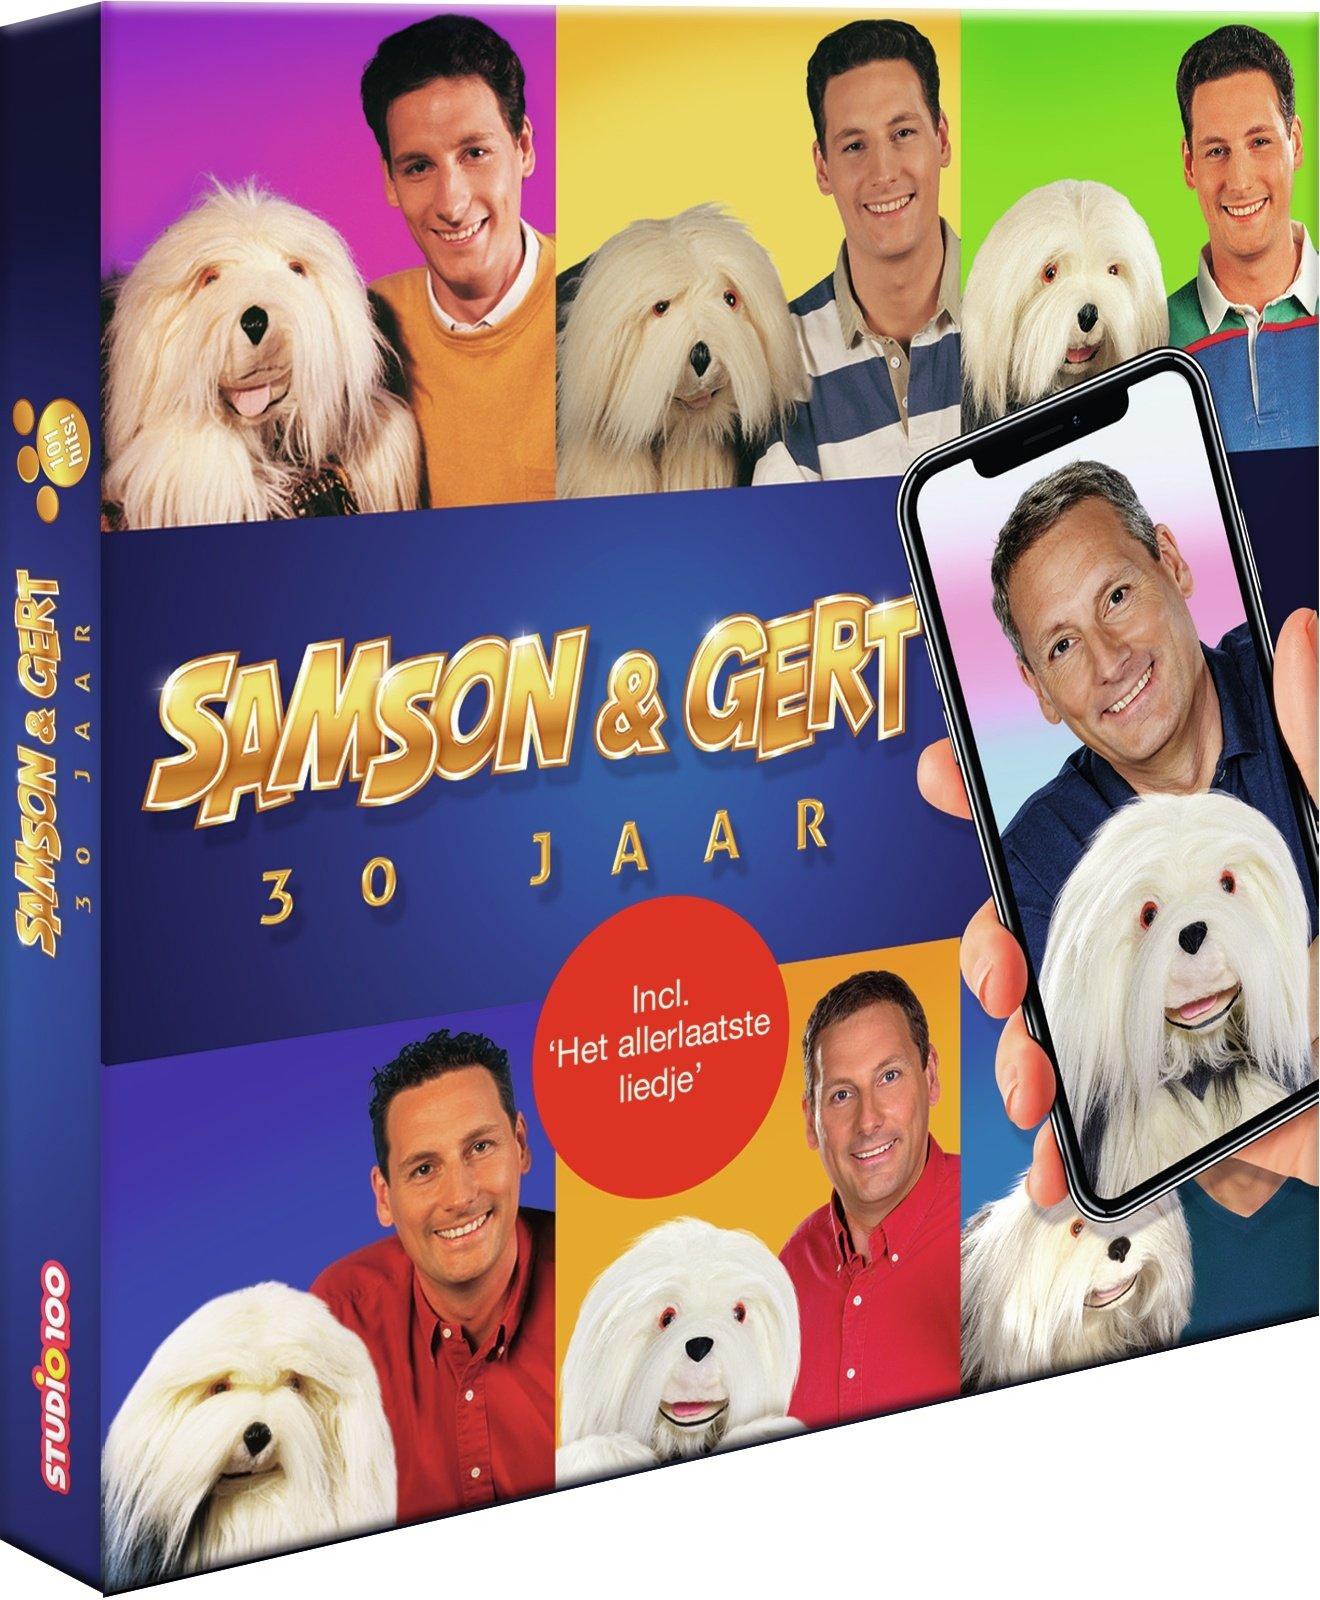 Samson & Gert CD: 30 jaar Samson & Gert